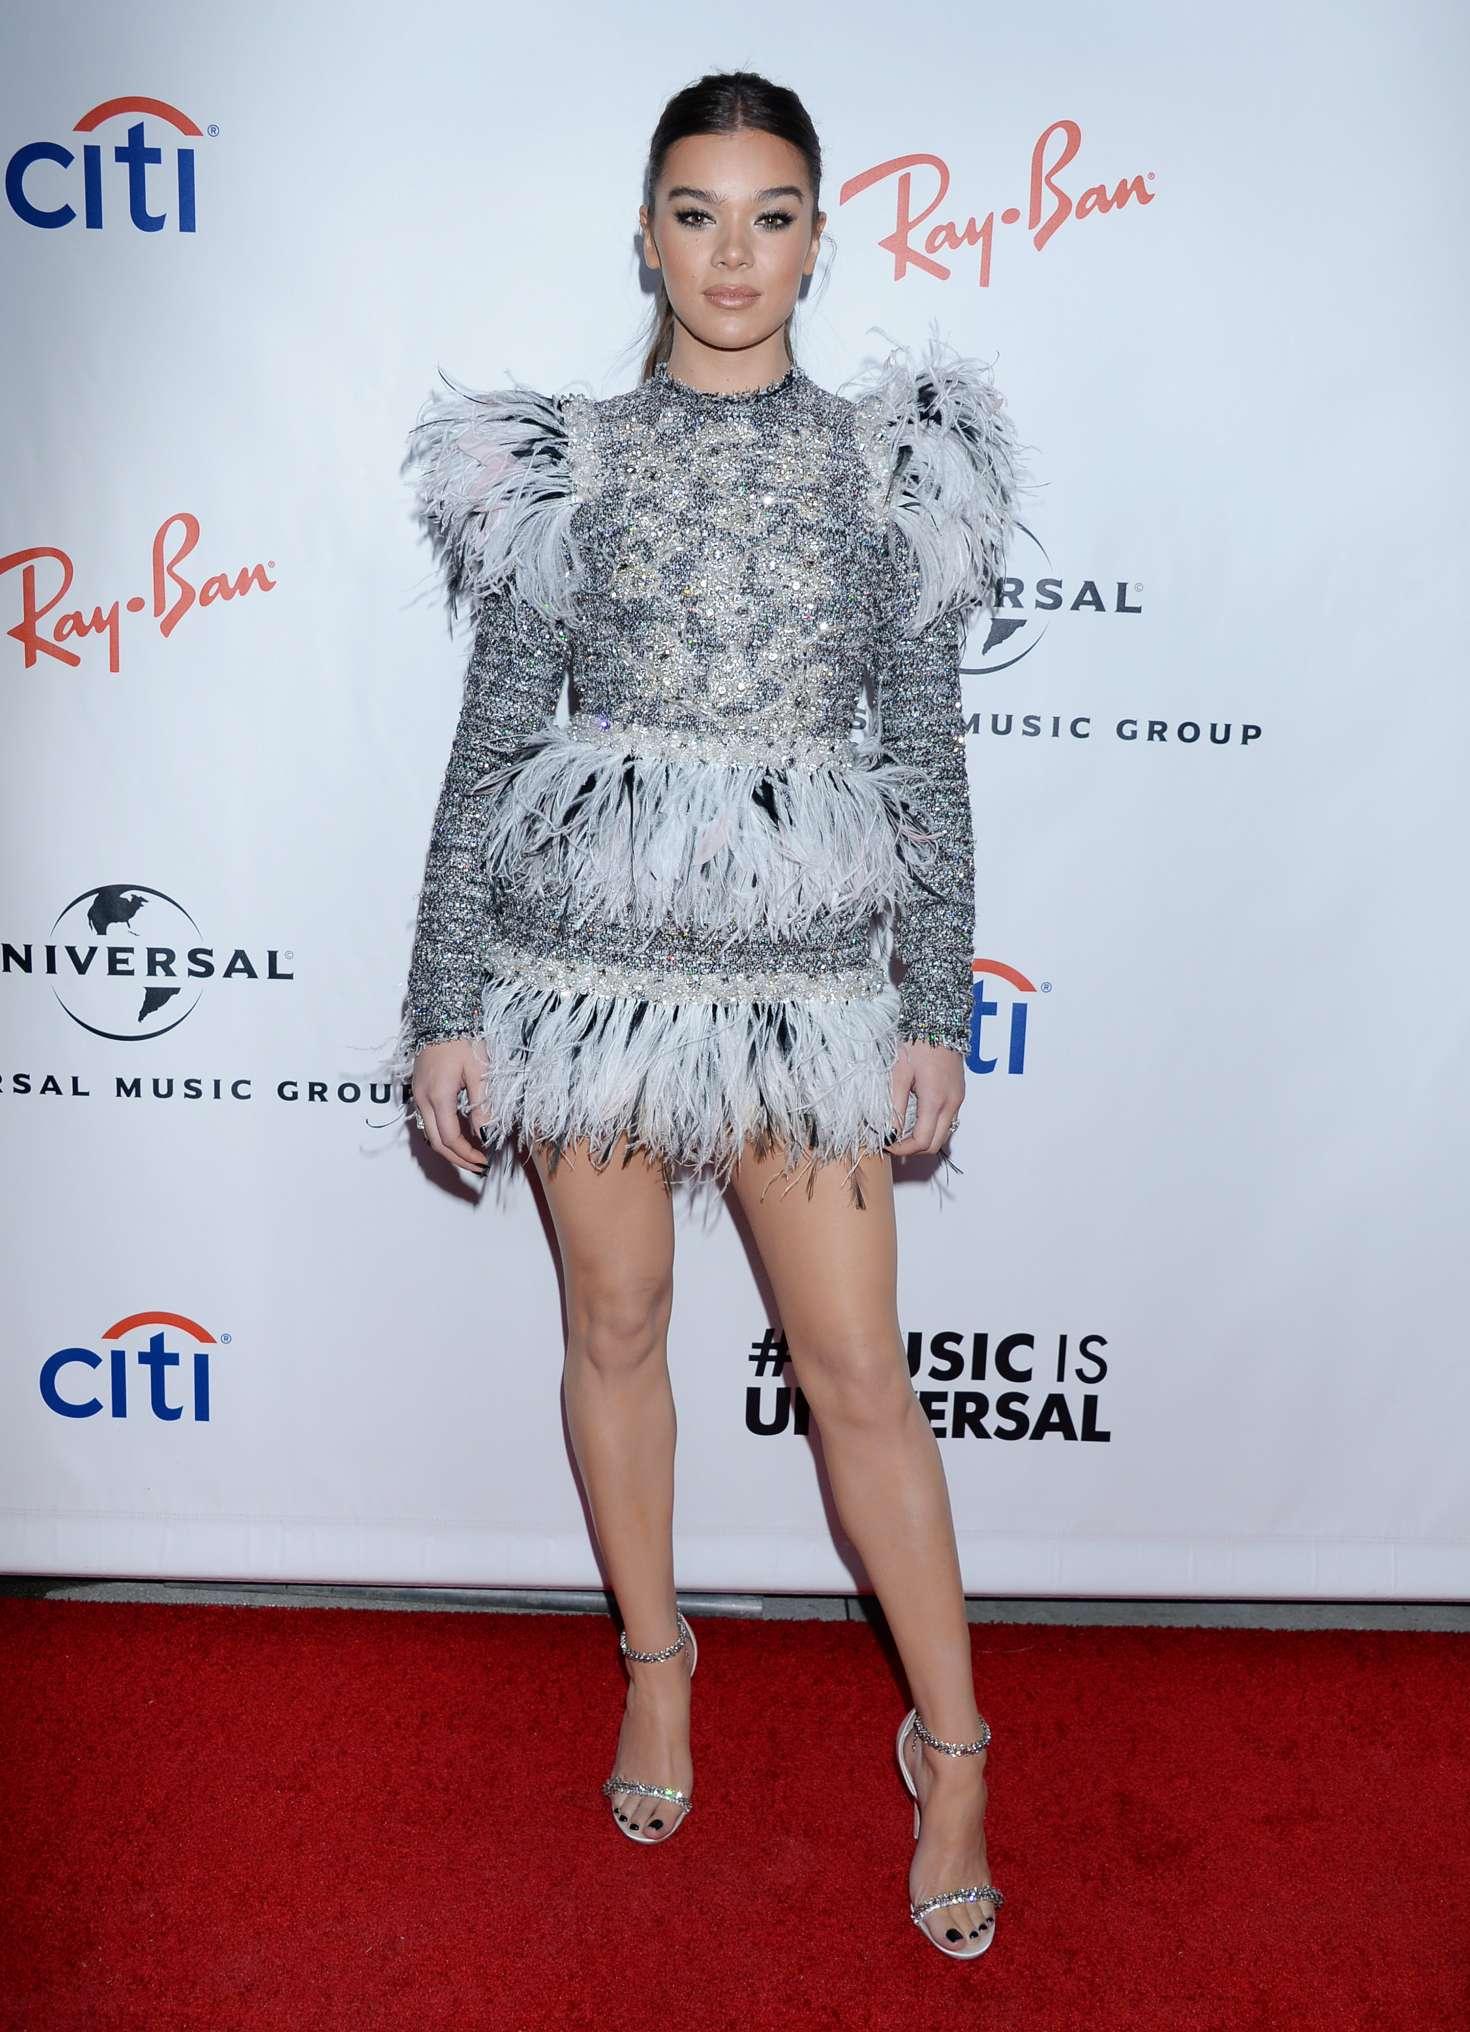 Hailee Steinfeld 2019 : Hailee Steinfeld: 2019 Universals Grammys After Party -06